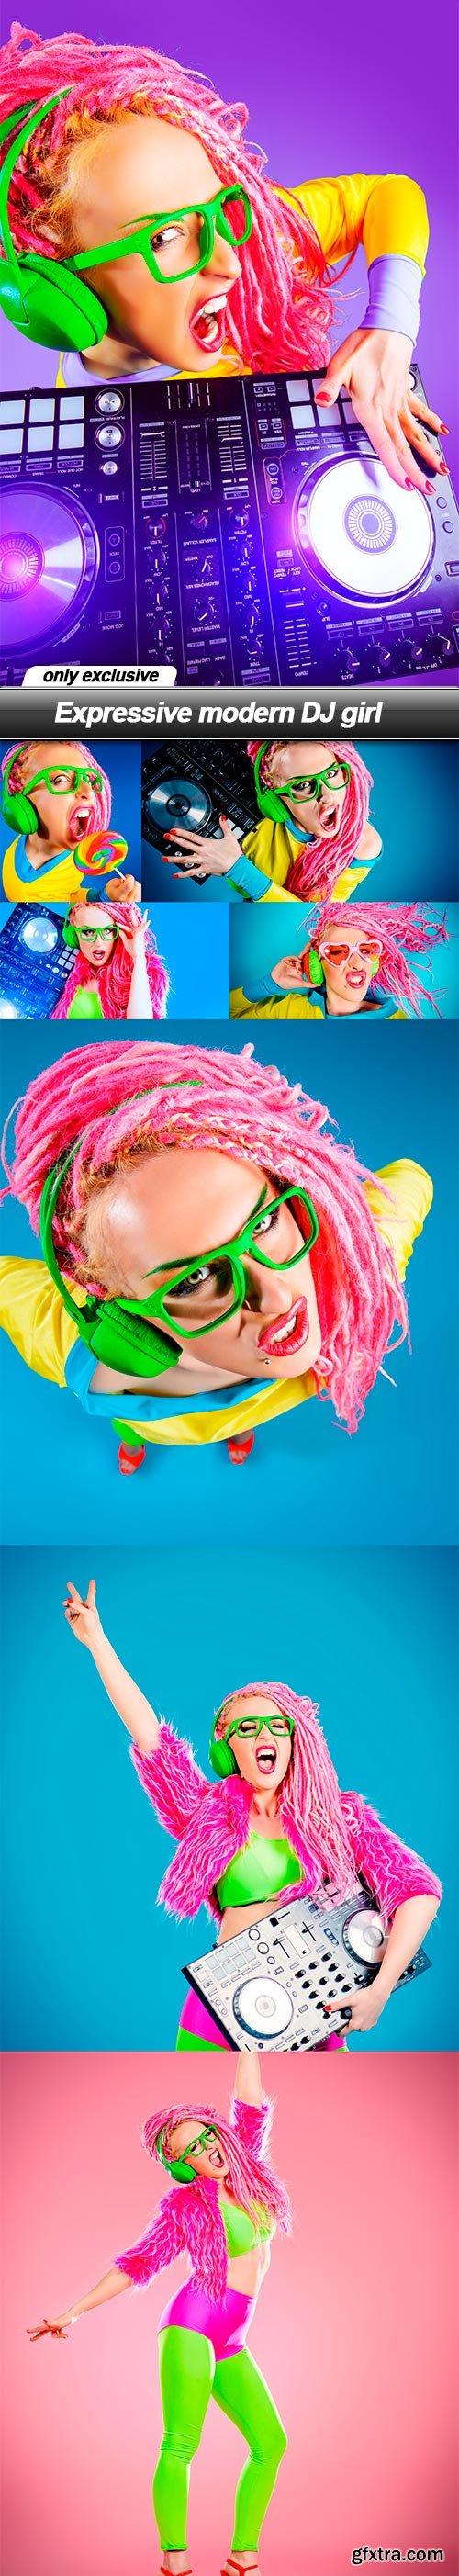 Expressive modern DJ girl - 8 UHQ JPEG